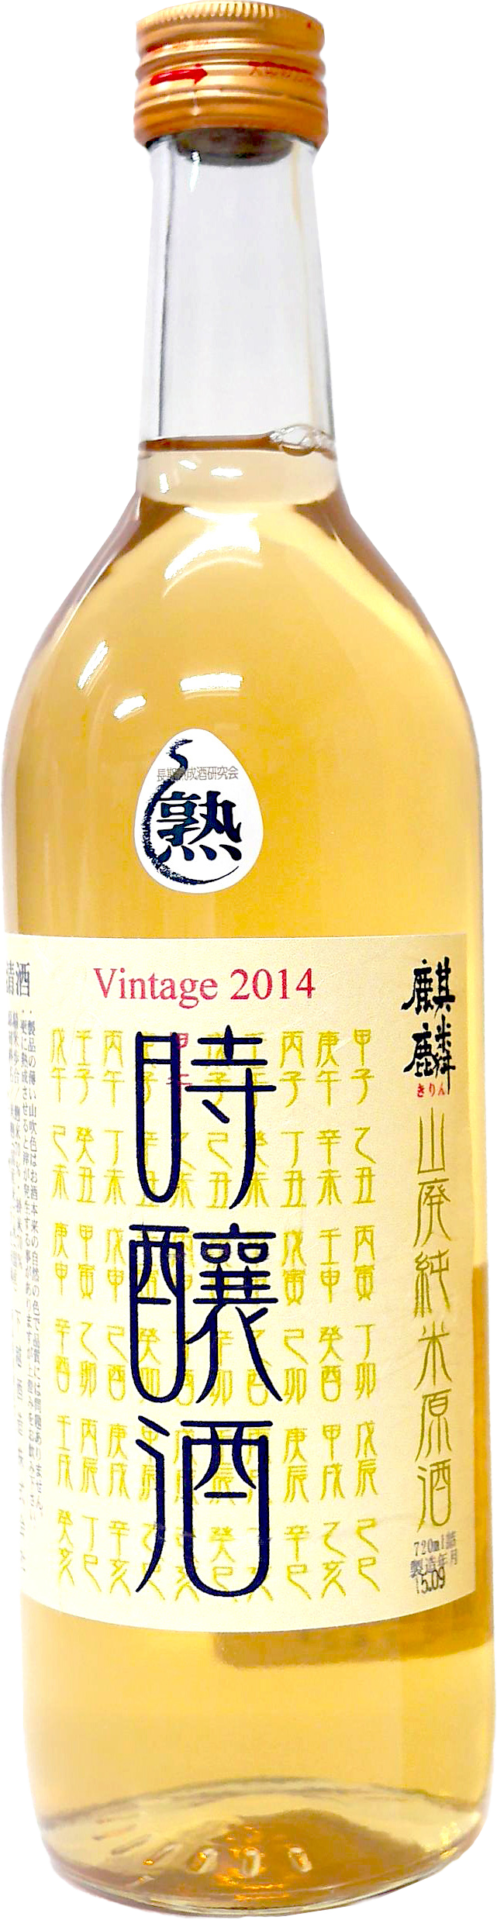 200140 Le Kirin KIRIN « Jijoshu Vintage » de la maison saké Kaetsu Shuzo